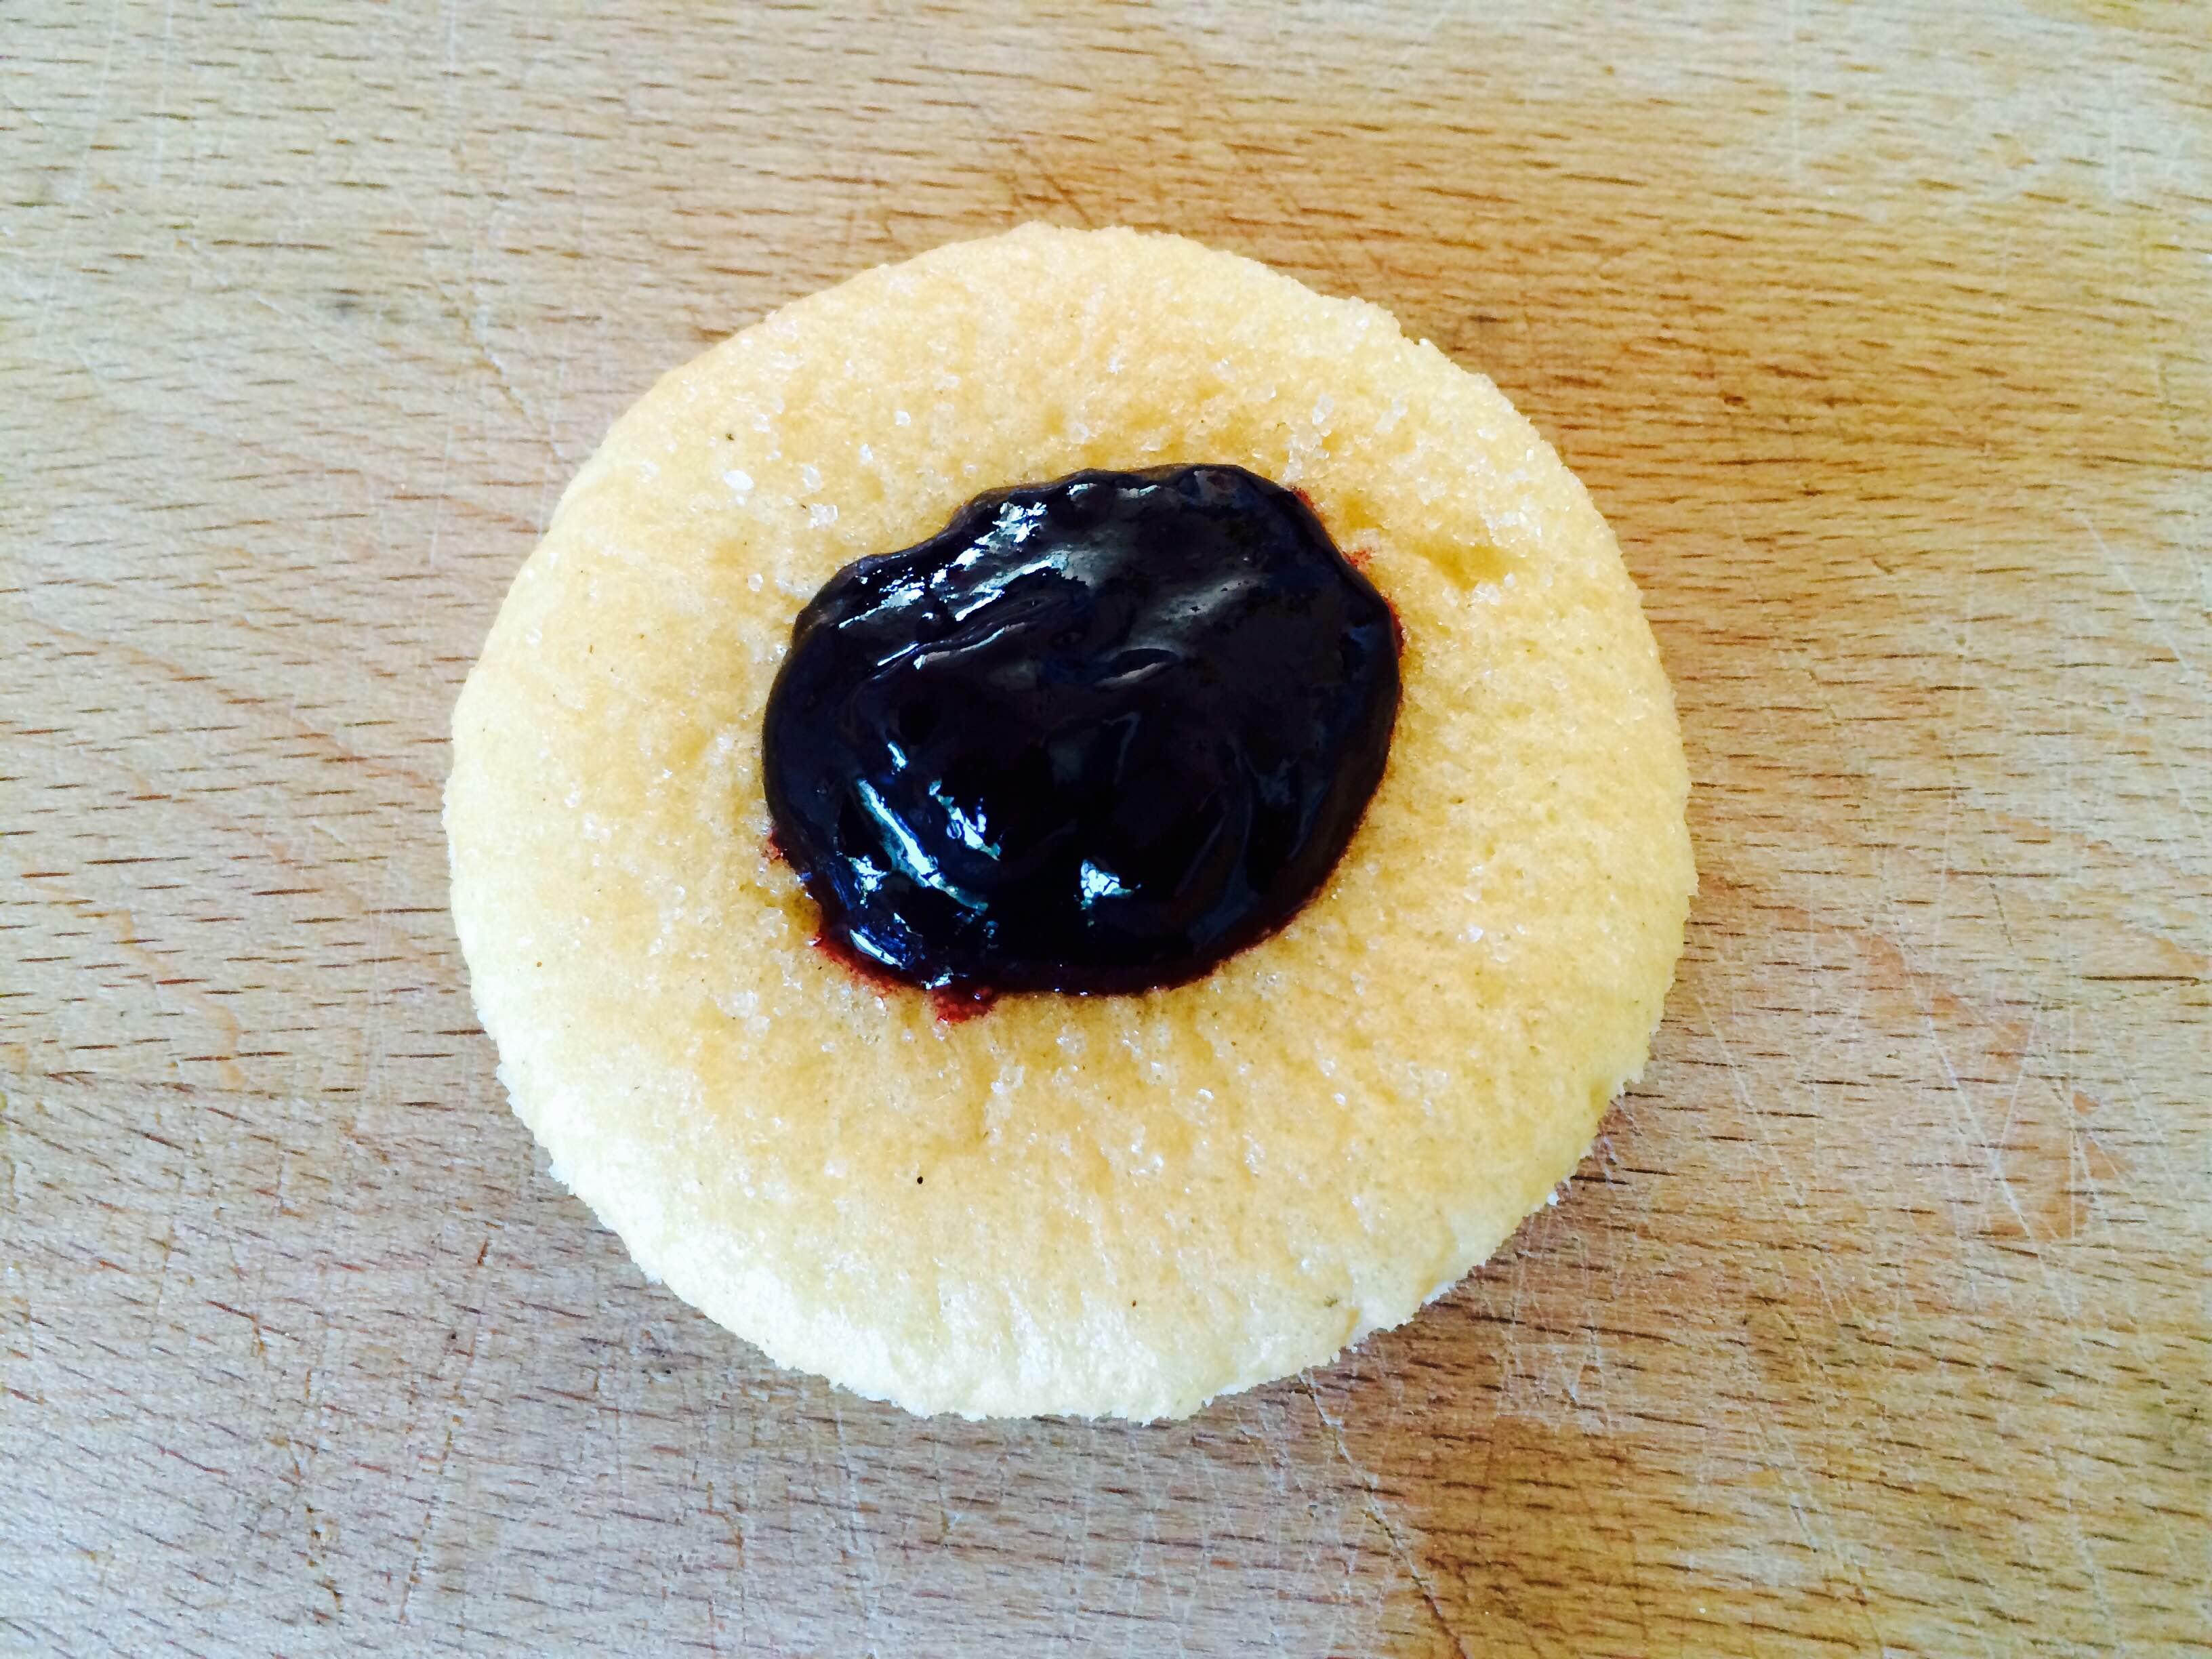 vaniljecreme til kage